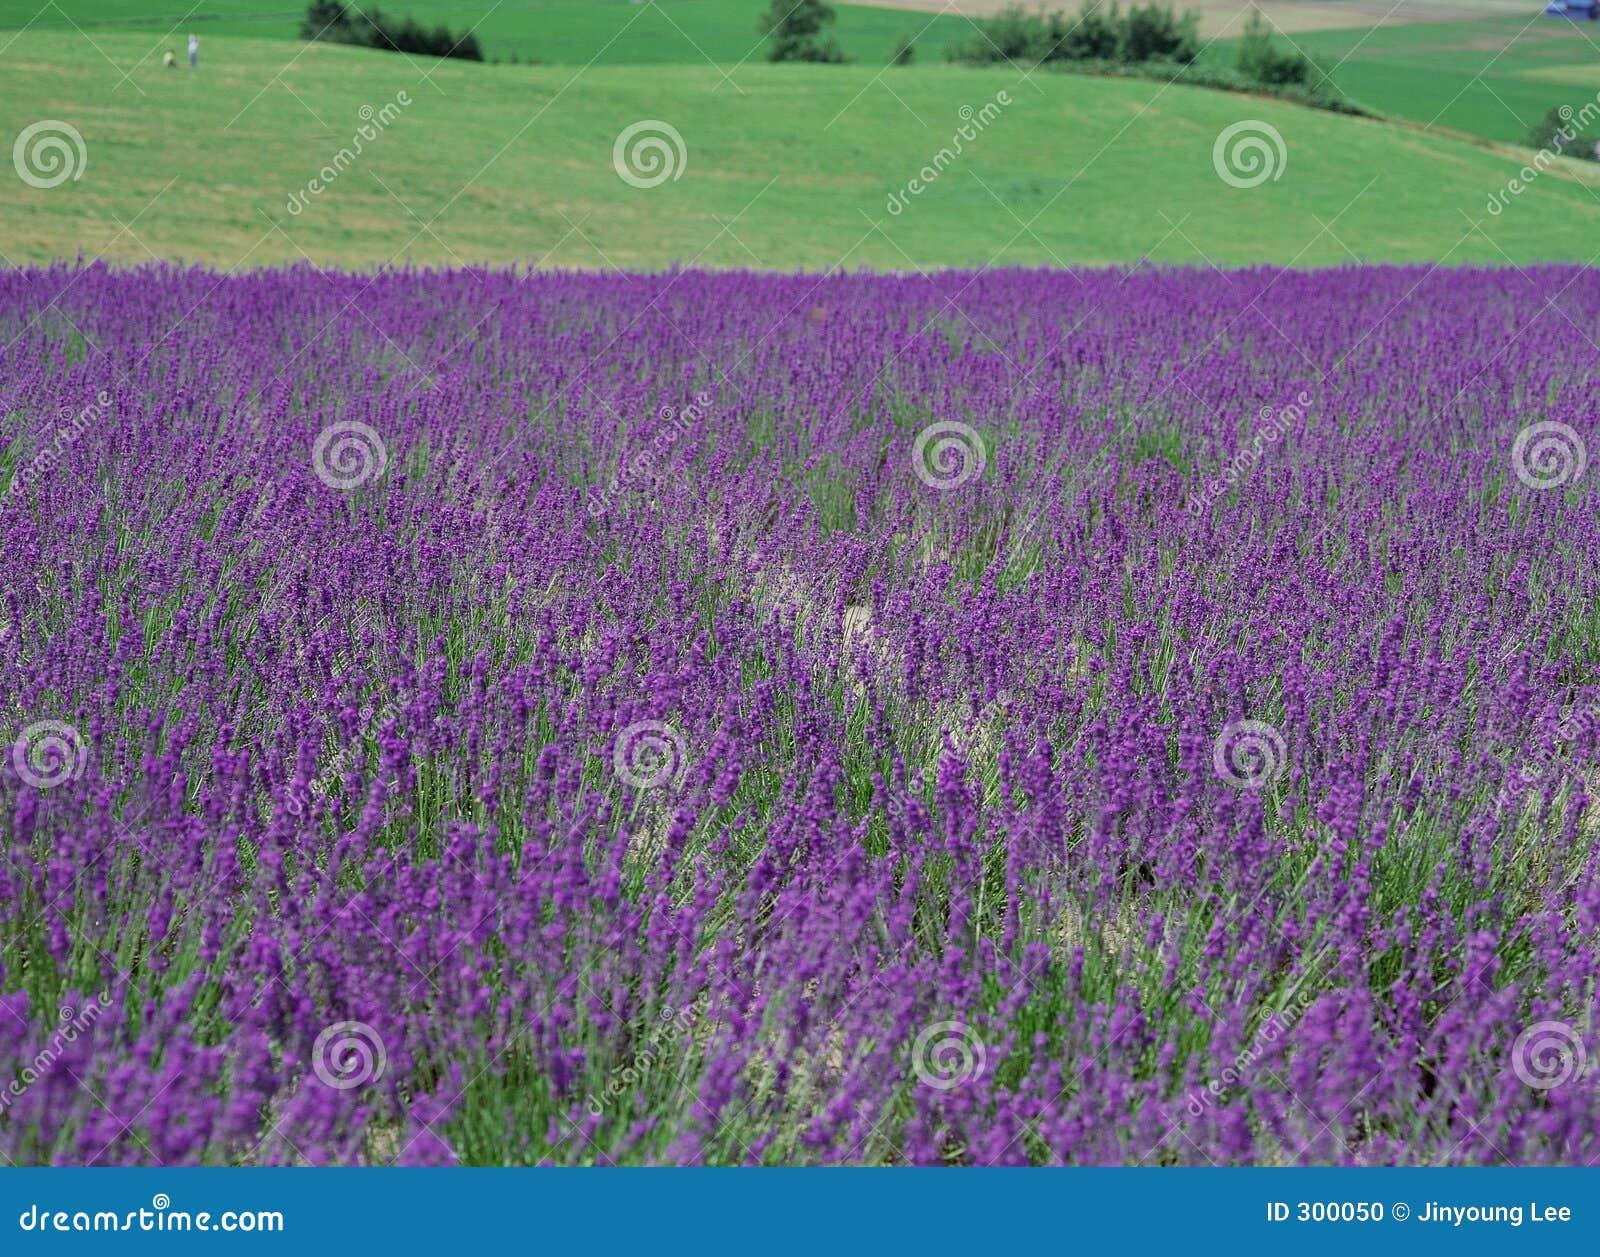 Download 开花通配 库存照片. 图片 包括有 背包, 庄稼, 紫罗兰色, 种植, 种田, 紫色, 丁香, 本质, 种子 - 300050